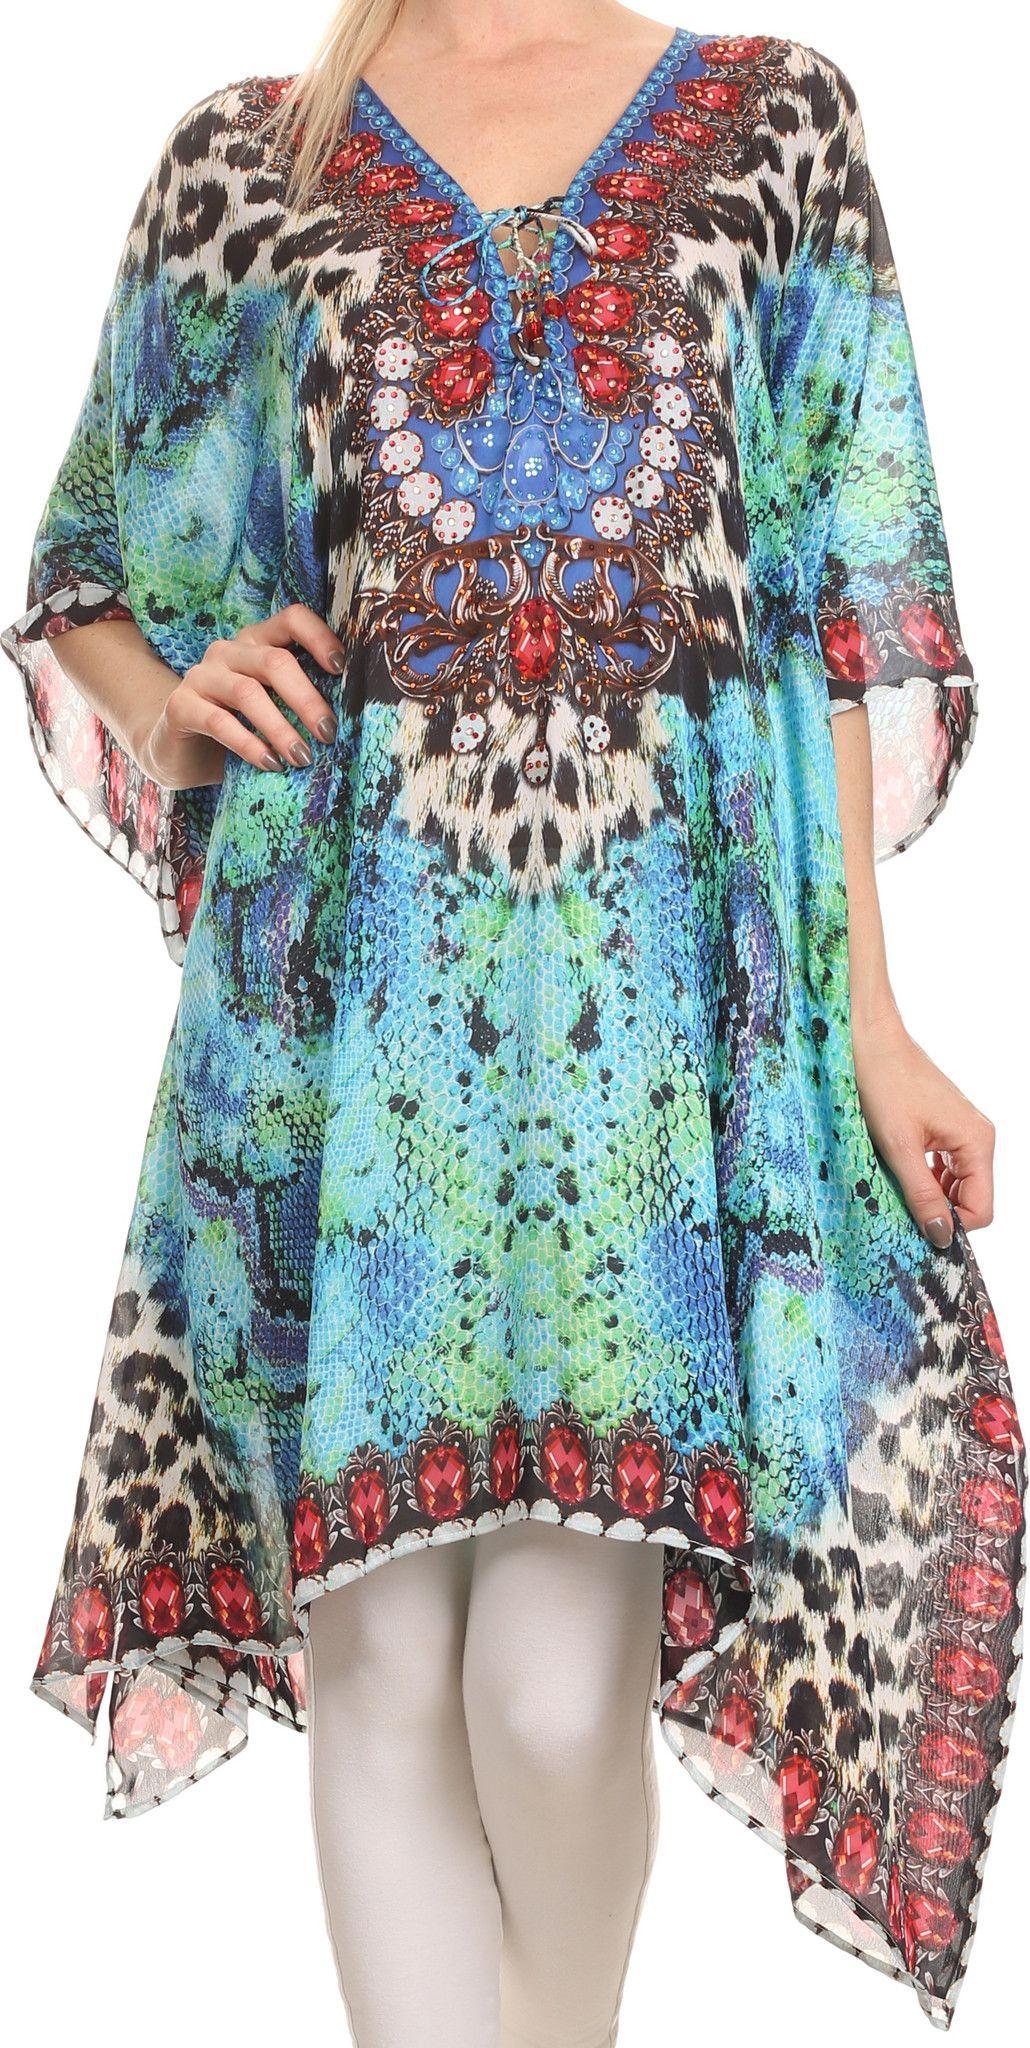 Sakkas Liv Ligthweight Summer Printed Short Caftan Dress Cover Up Caftan Dress Dress Cover Dresses [ 2048 x 1030 Pixel ]